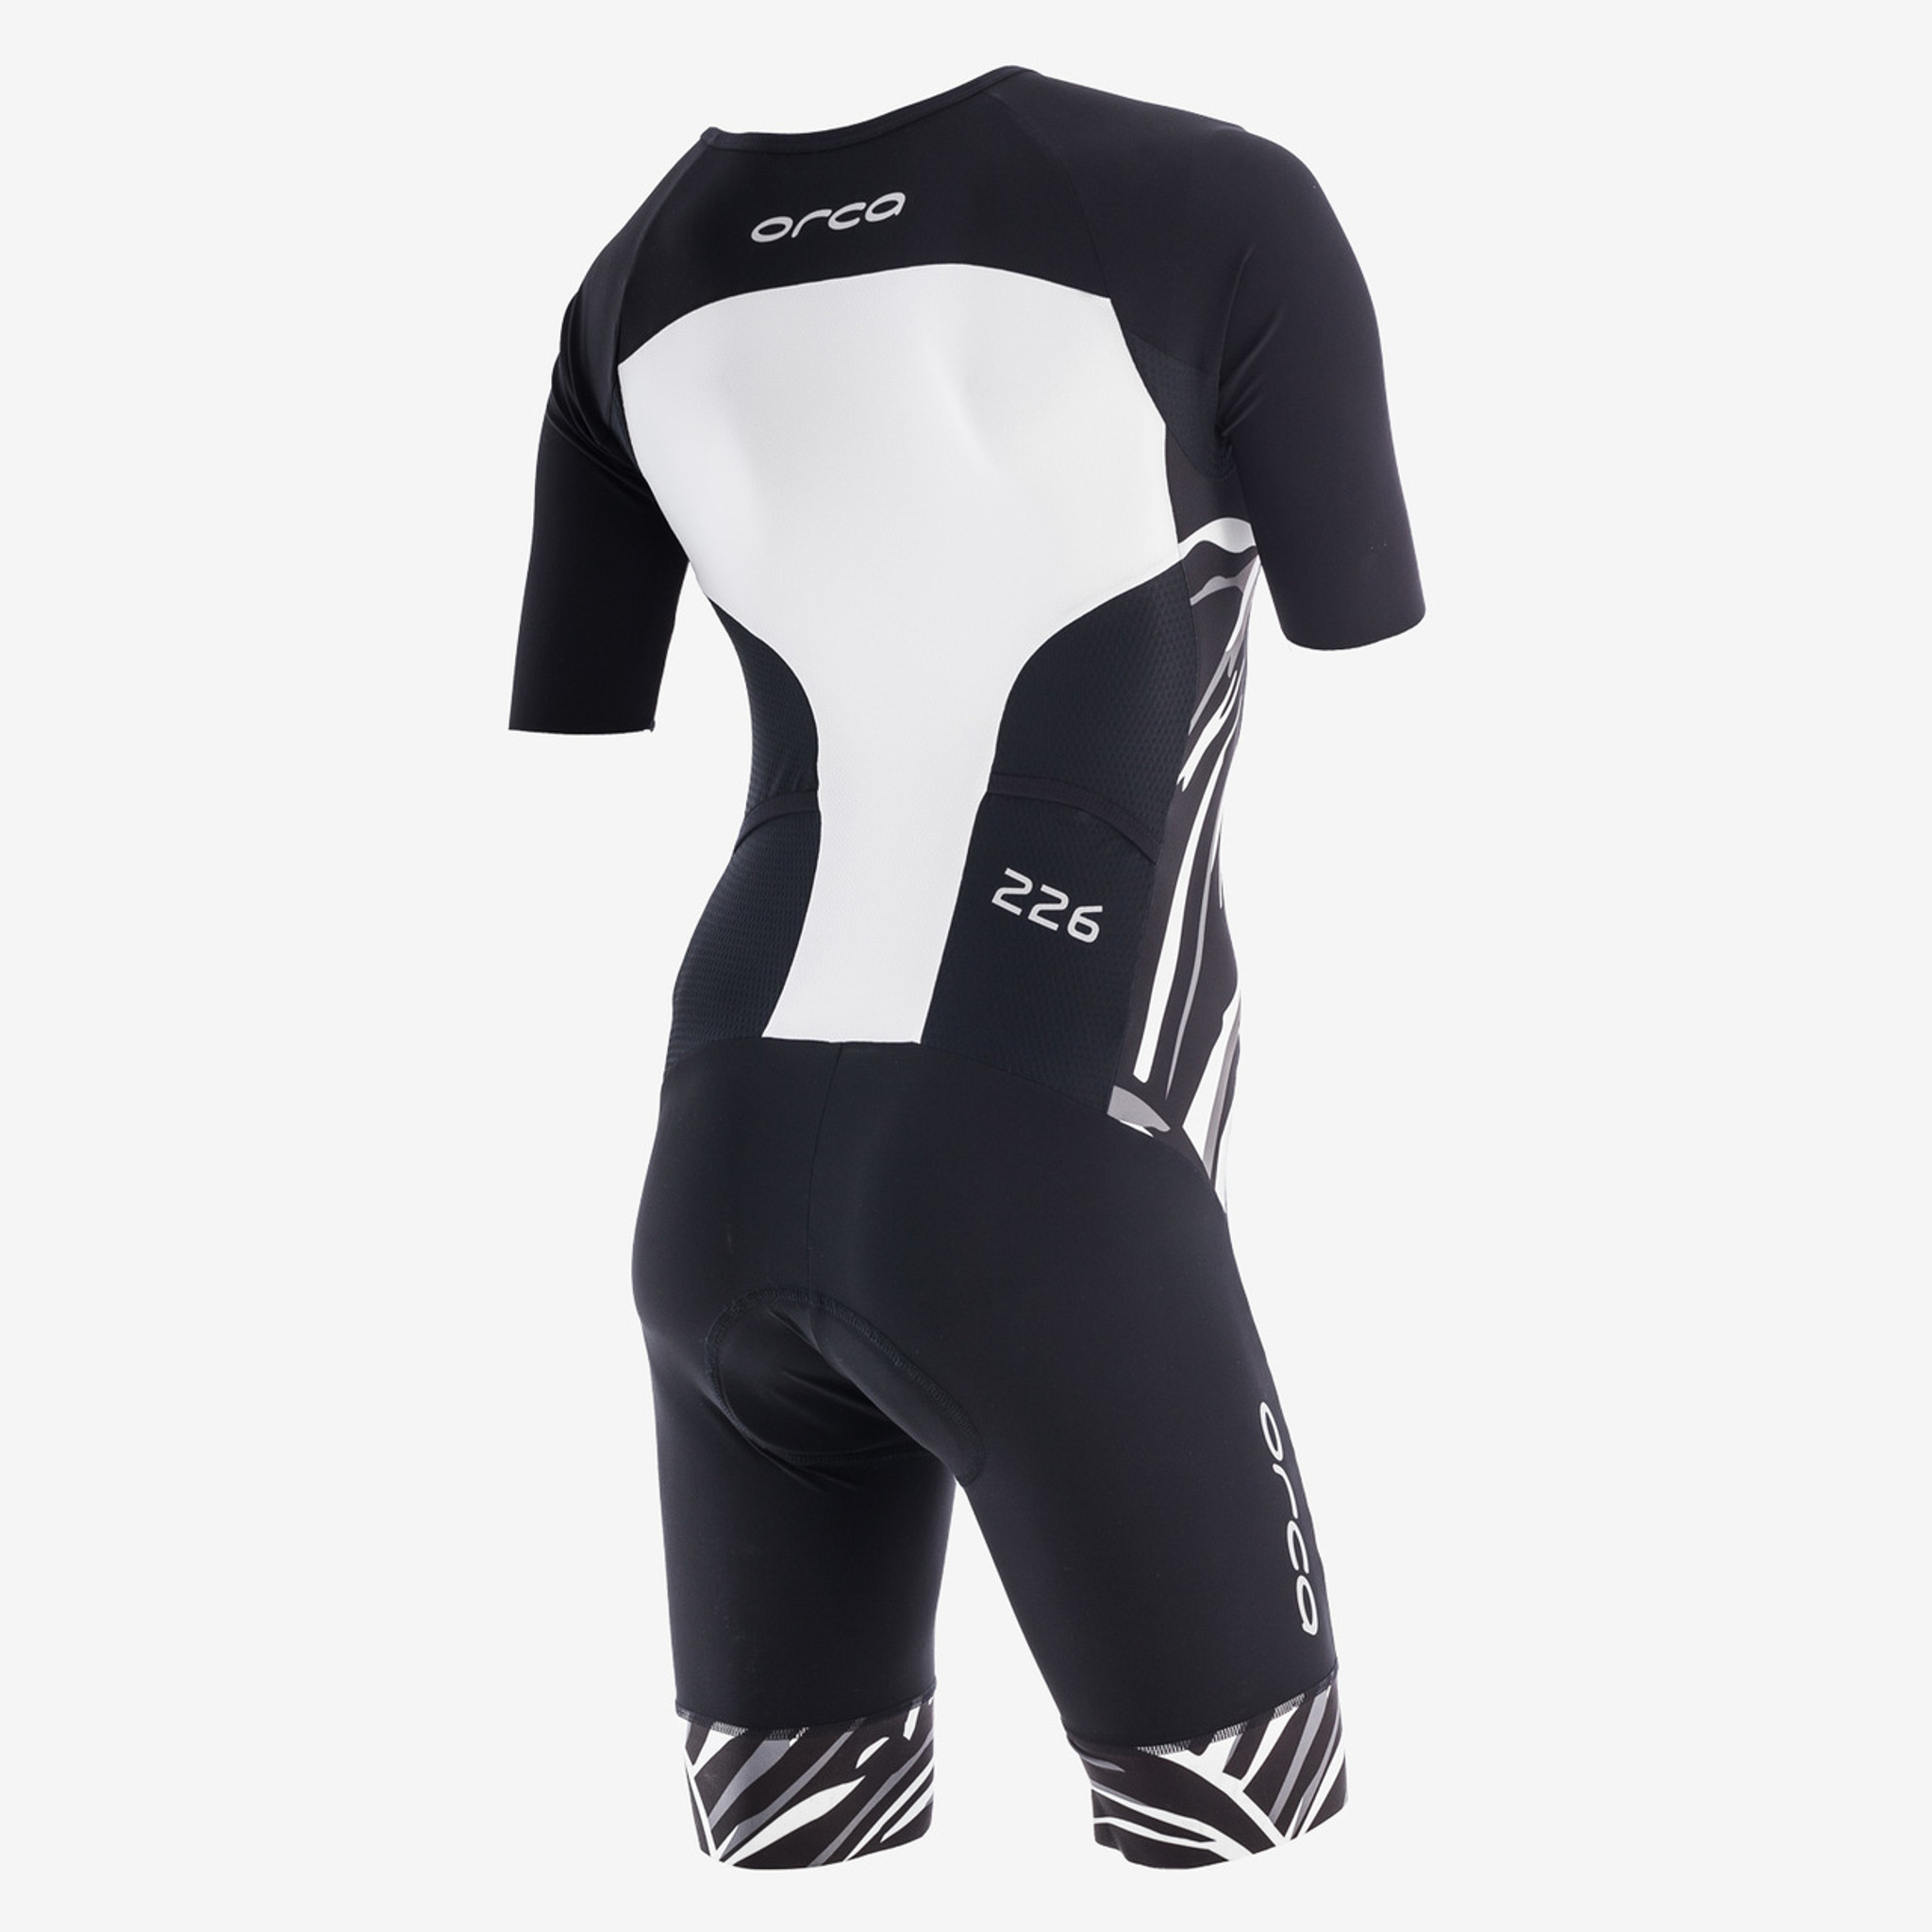 Orca - 226 Kompress Short Sleeve Race Suit - Women s 2279f2062